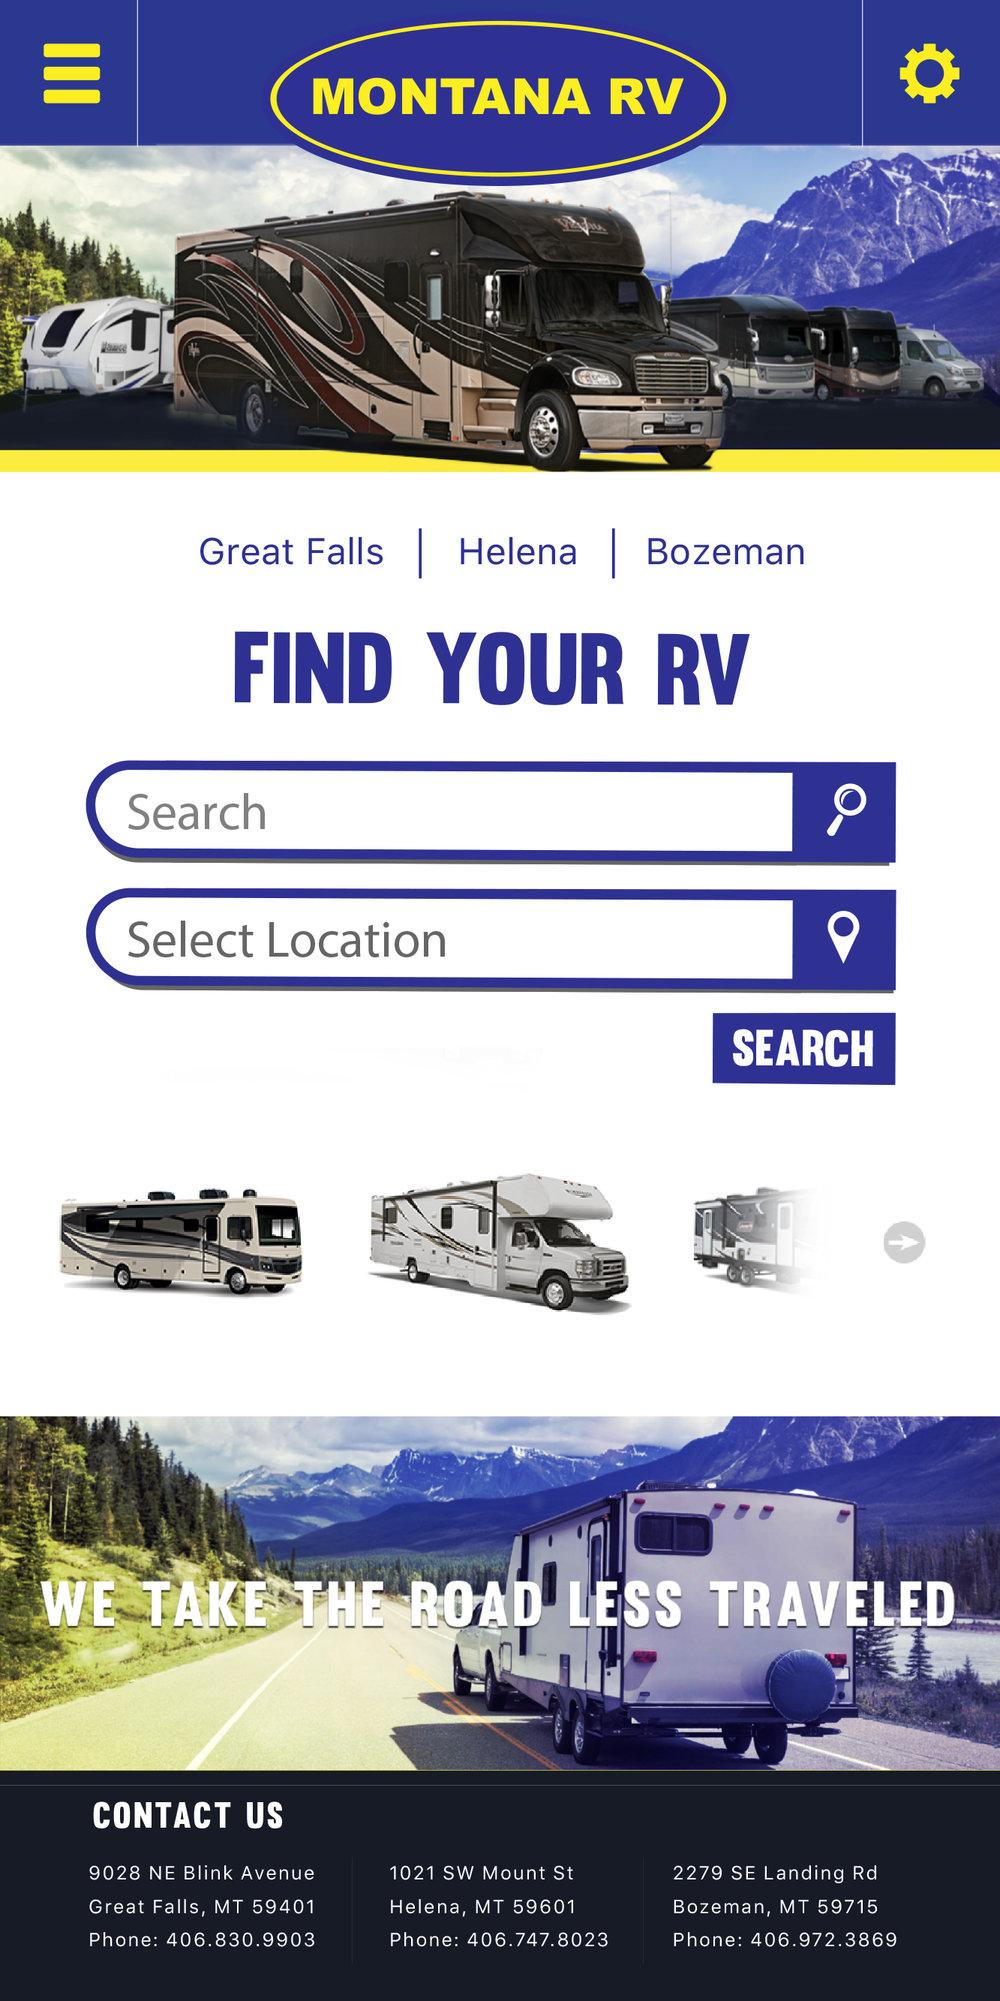 Montana_RV_Mobile_Website_JB.jpg